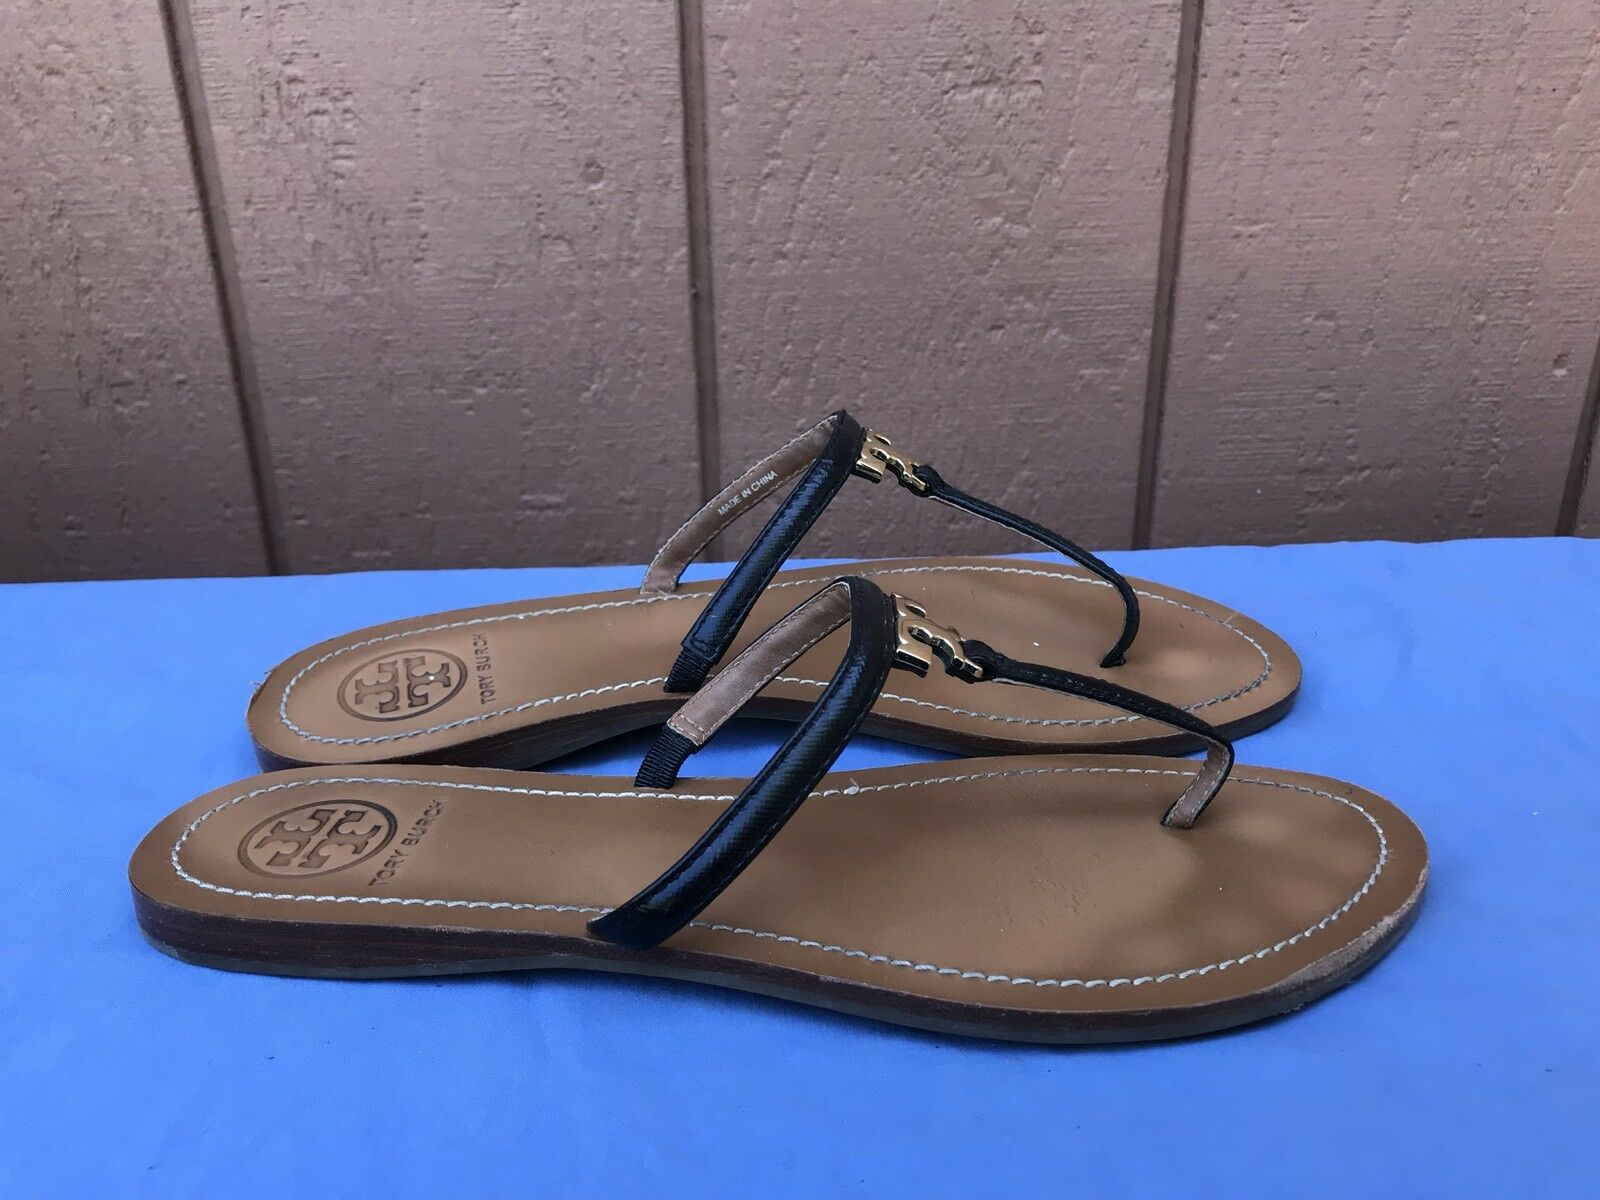 EUC Tory Burch US 9.5 nero Leather oro T Logo Thong Flip Flop Sandal scarpe A4